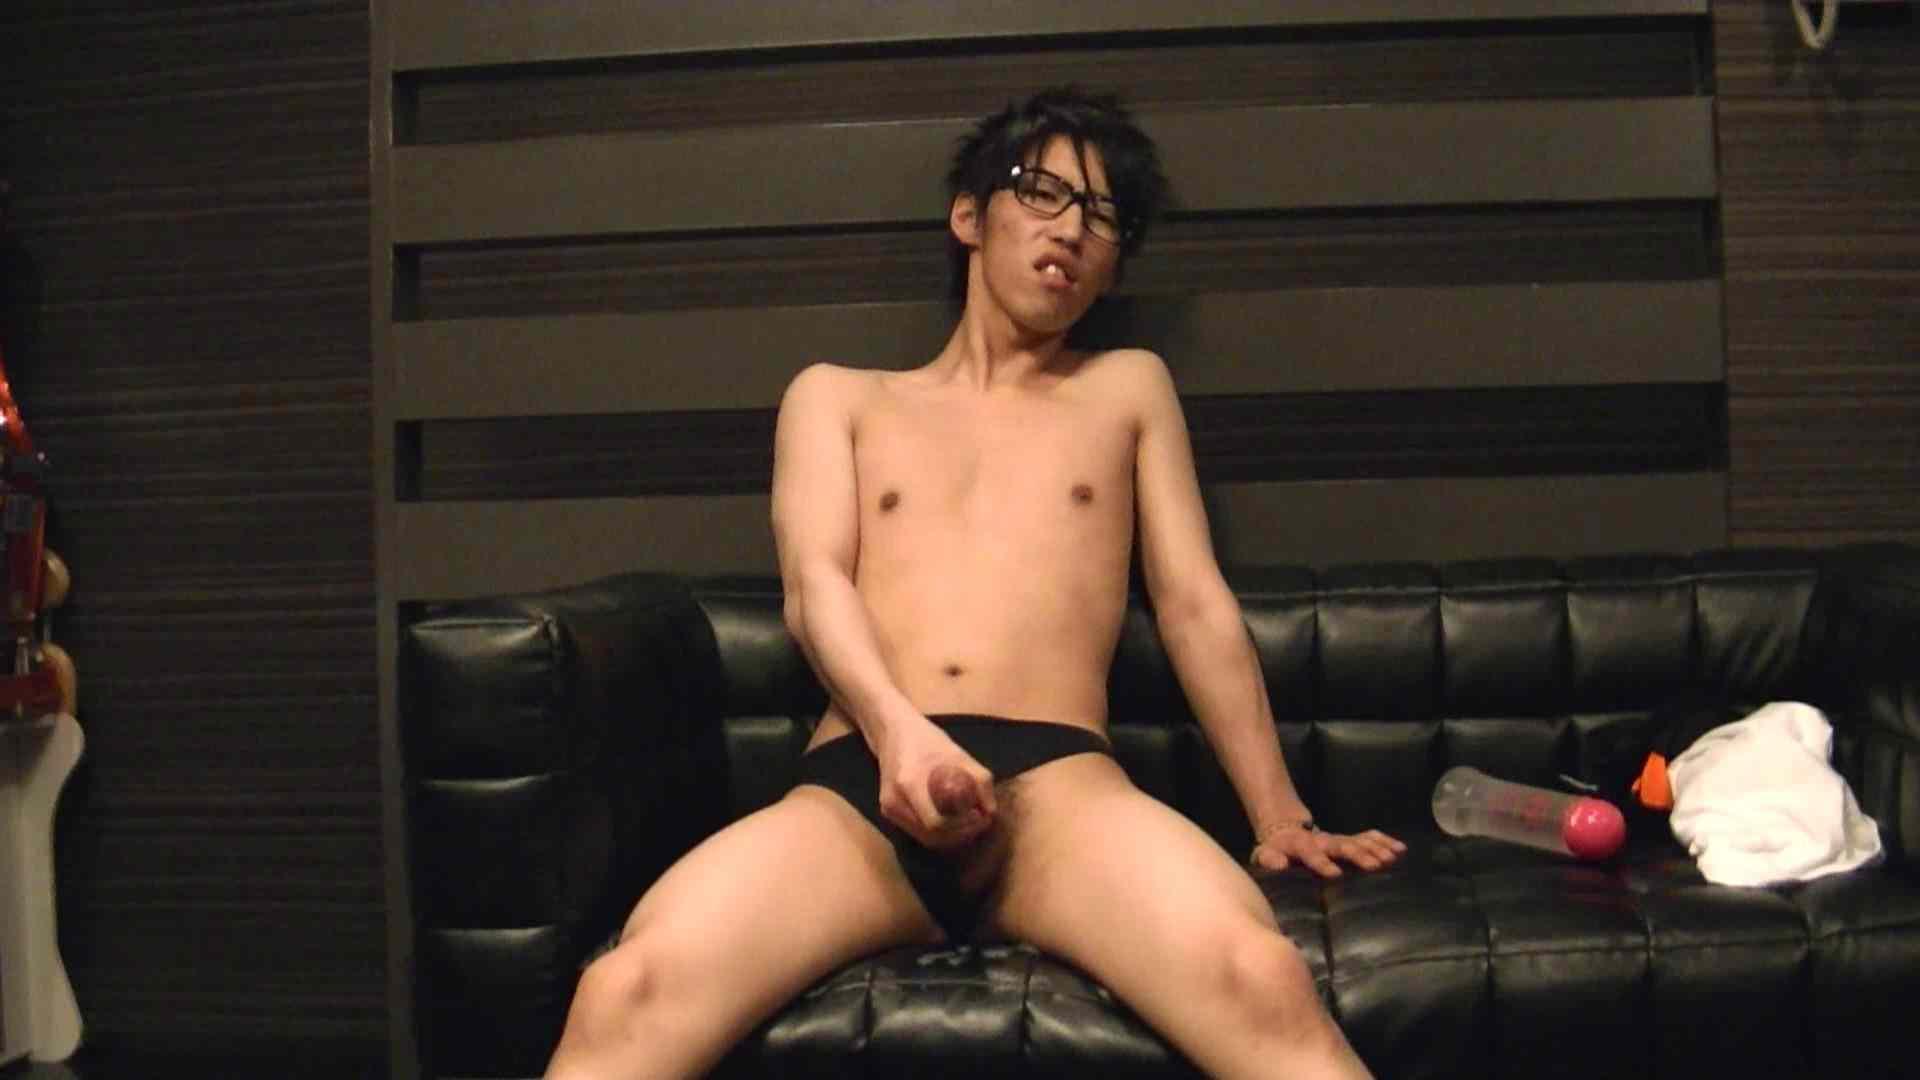 ONA見せカーニバル!! Vol3 男  93pic 15